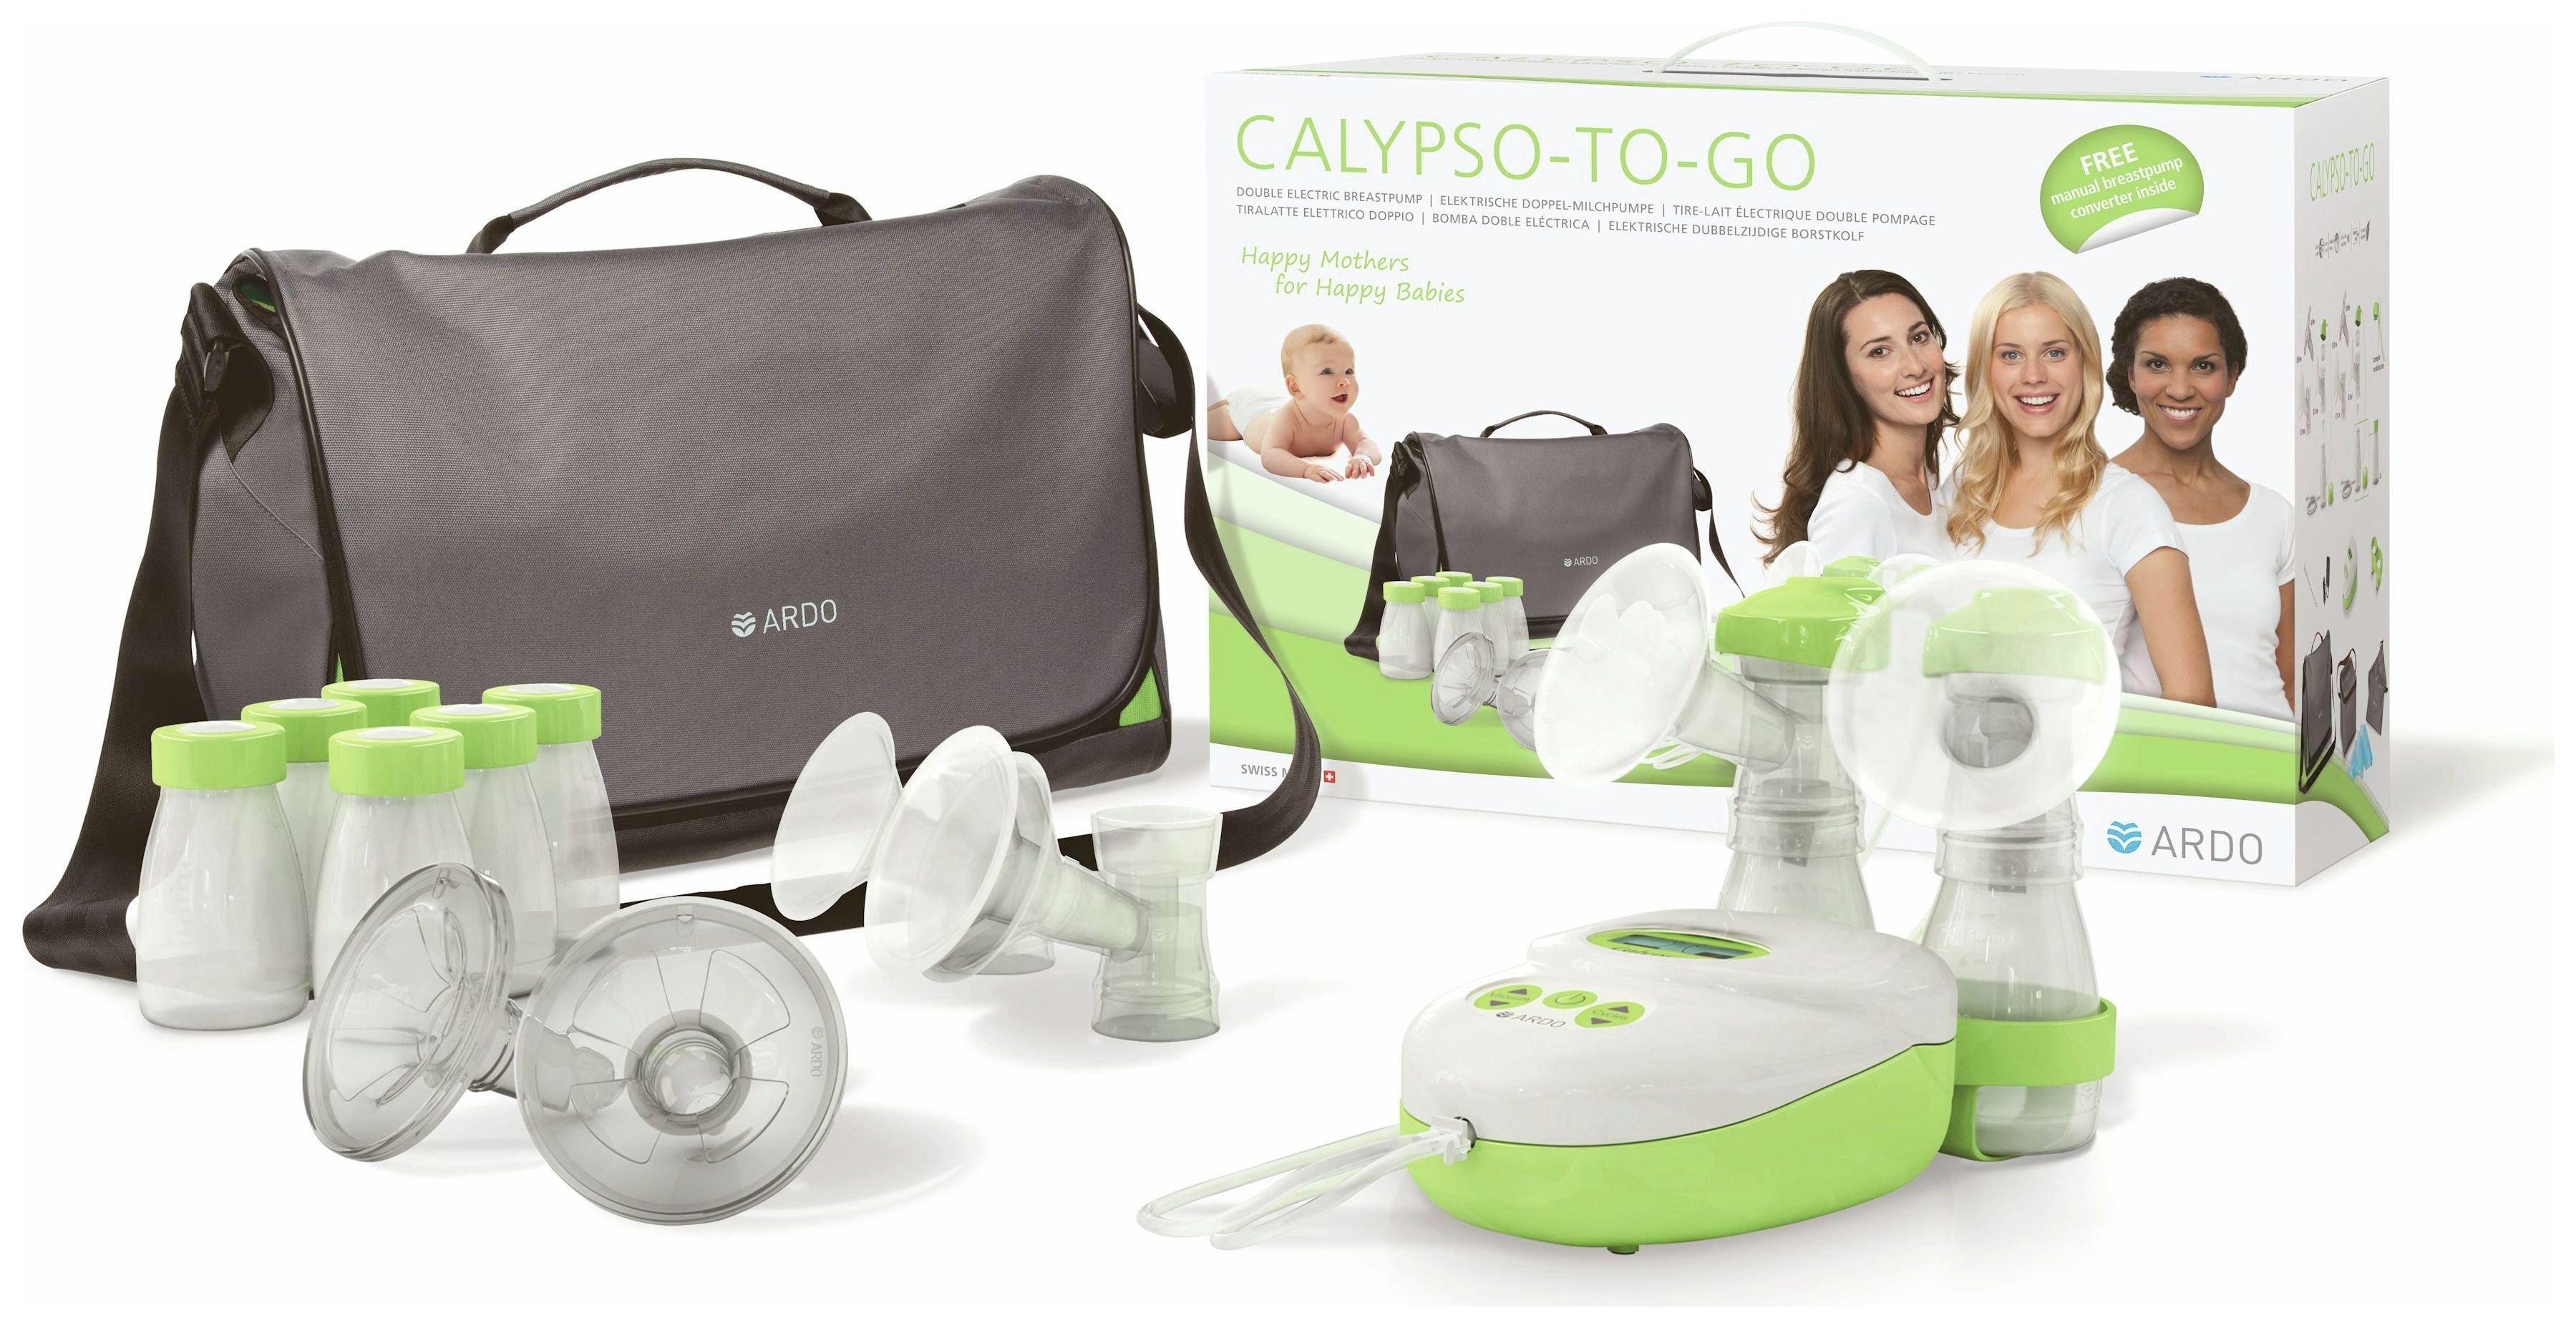 Ardo Calypso To Go Electric Breast Pump.